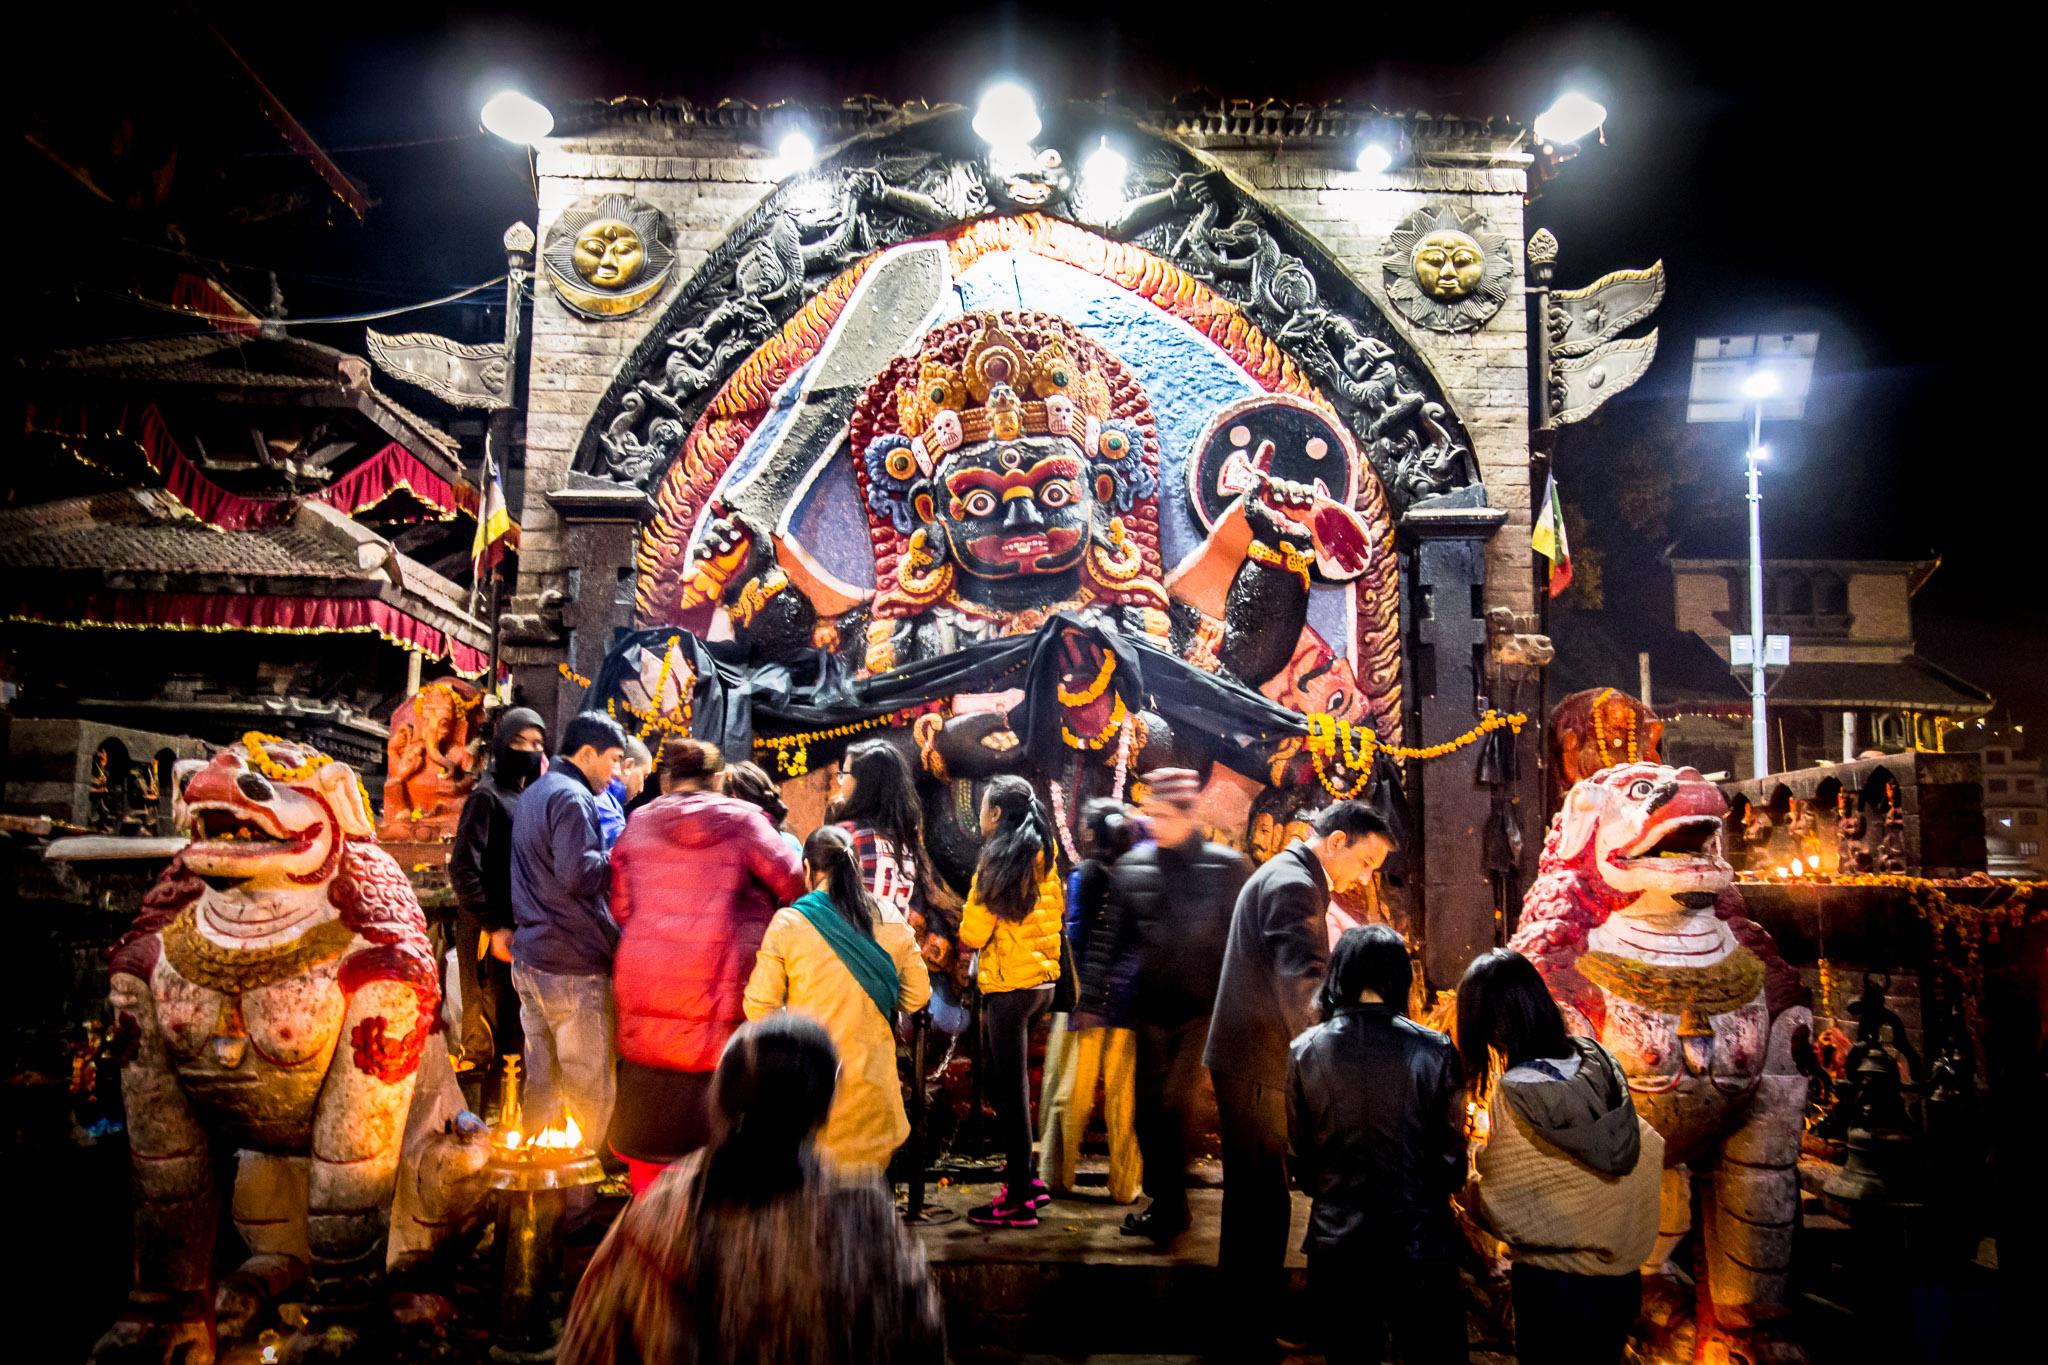 "The Hindu god represented is Bhairava (Sanskrit, ""Terrible, Frightful""), a fierce manifestation of Shiva associated with annihilation."